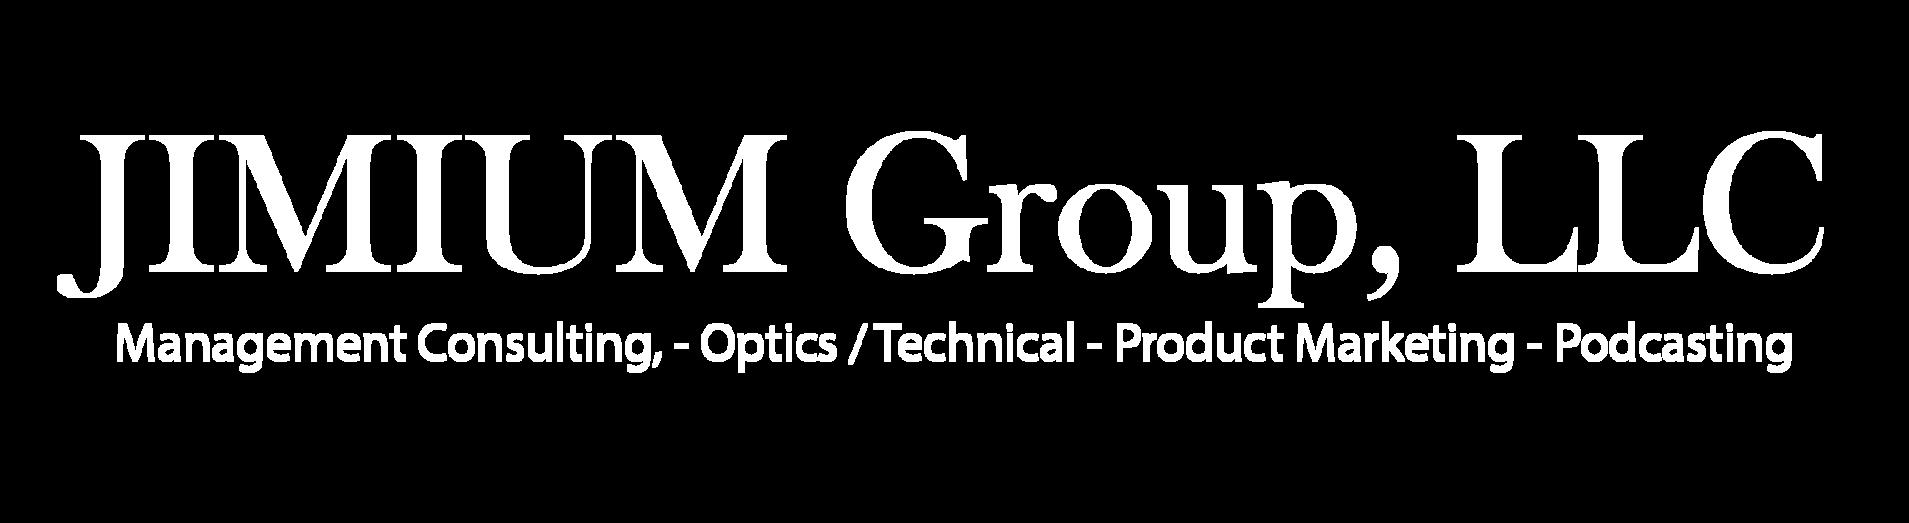 JIMIUM Group, LLC logo